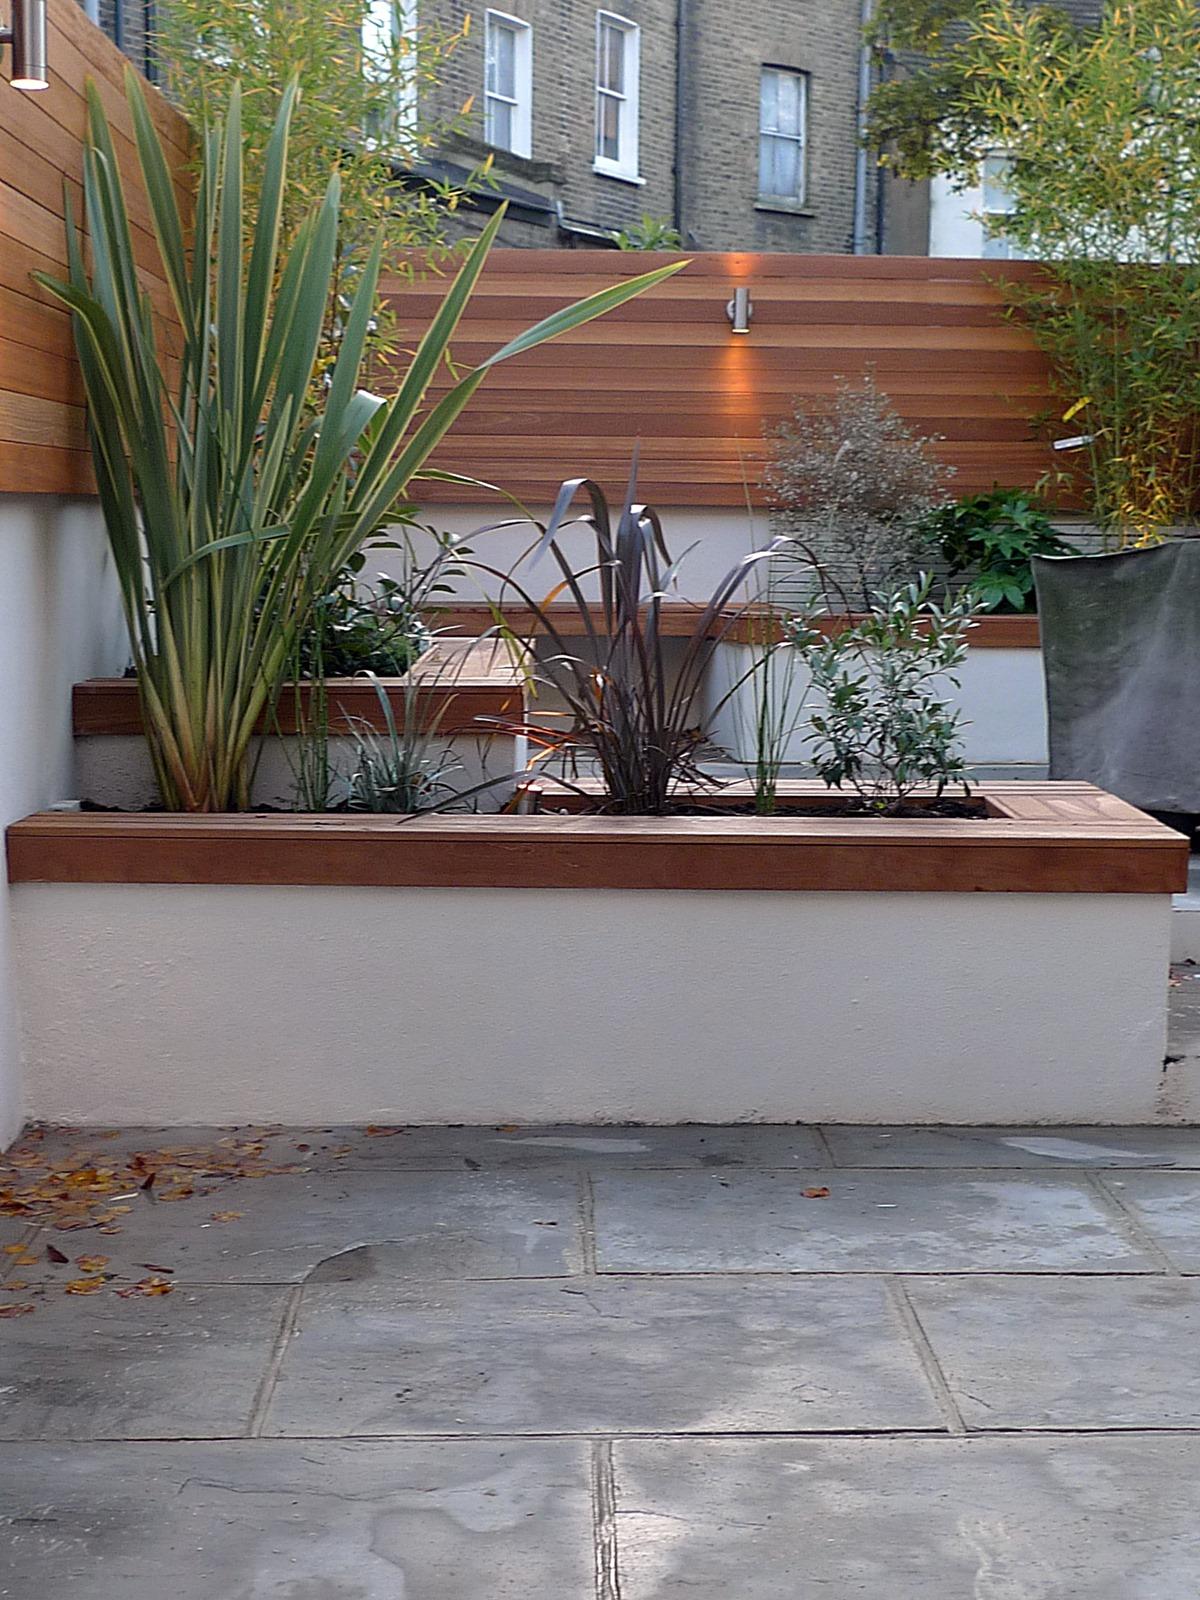 modern london courtyard low maintenance urban outdoor indoor living garden space paving screens planting bench raised beds (3)